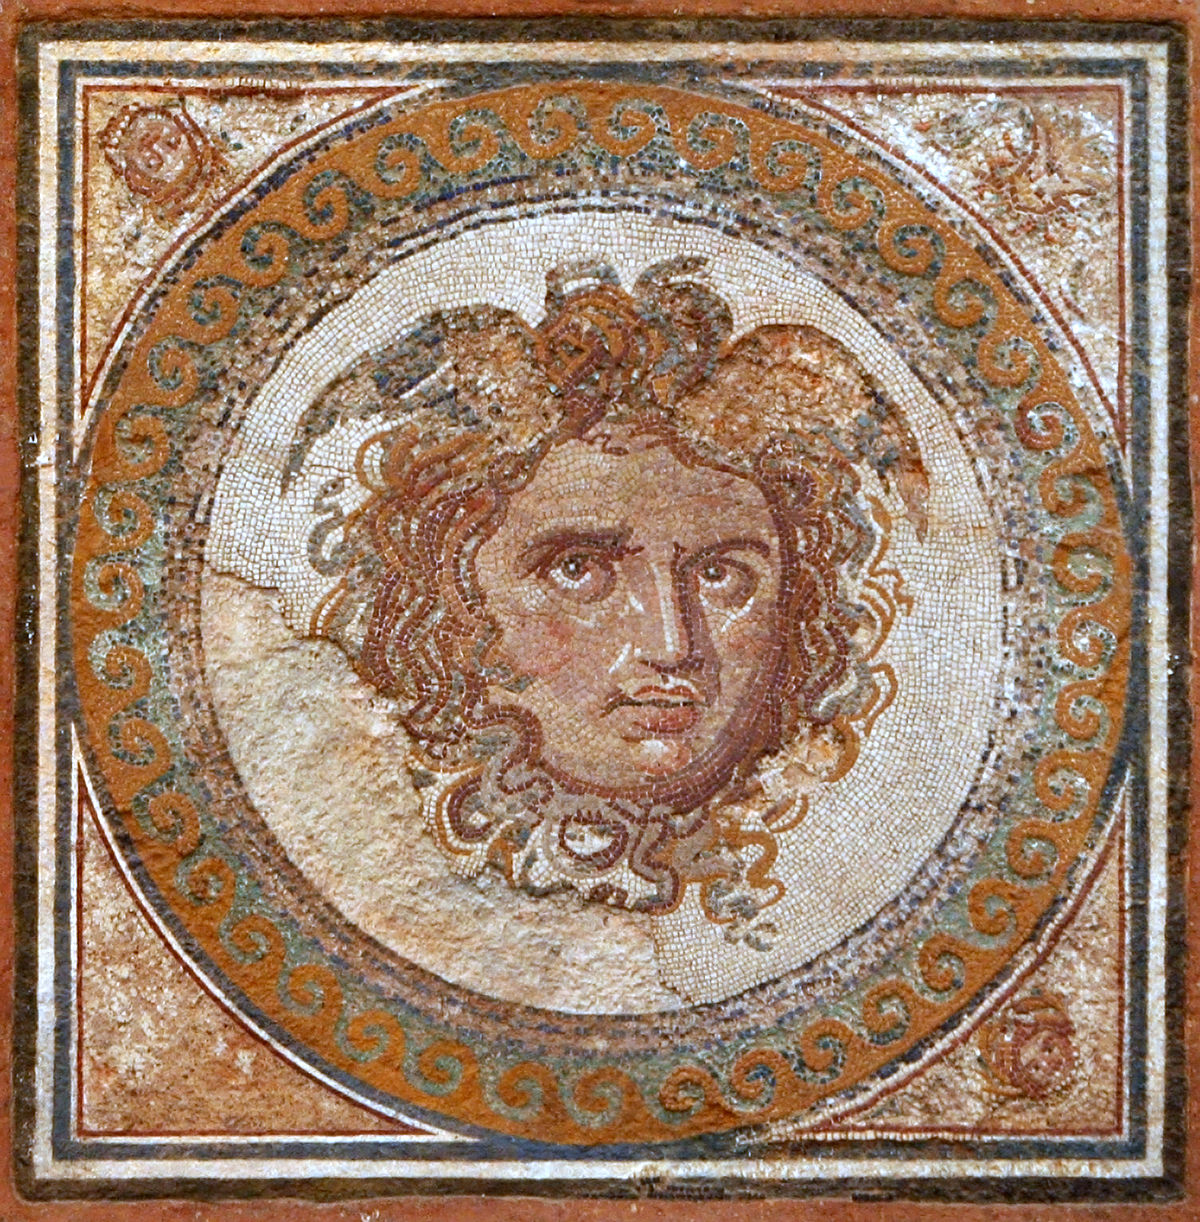 Mosaic de la Medusa2.JPG